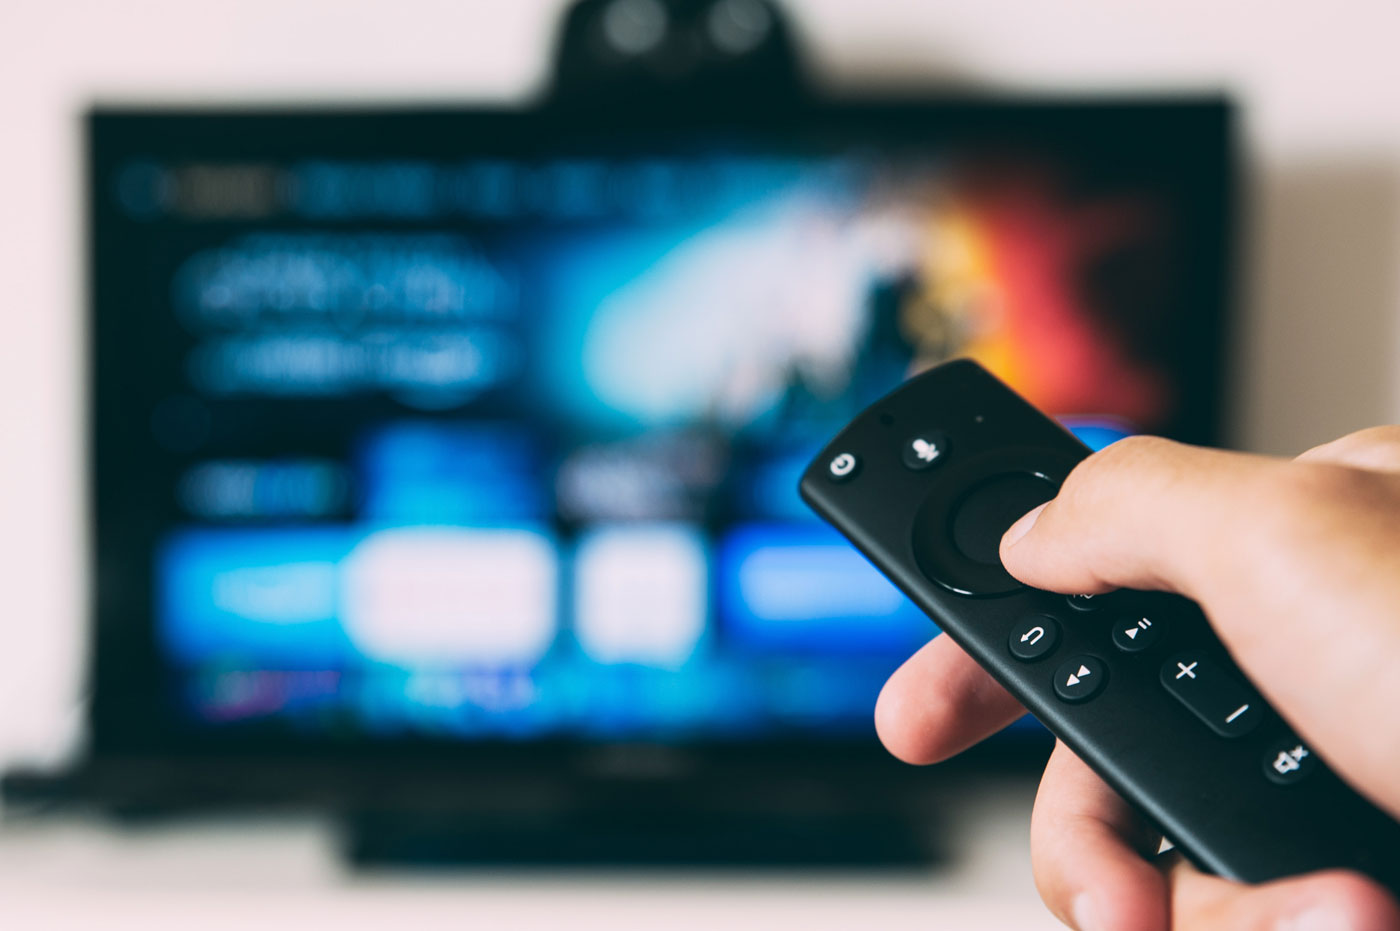 📺 Застосунок Apple Music стане доступним на Samsung Smart TV